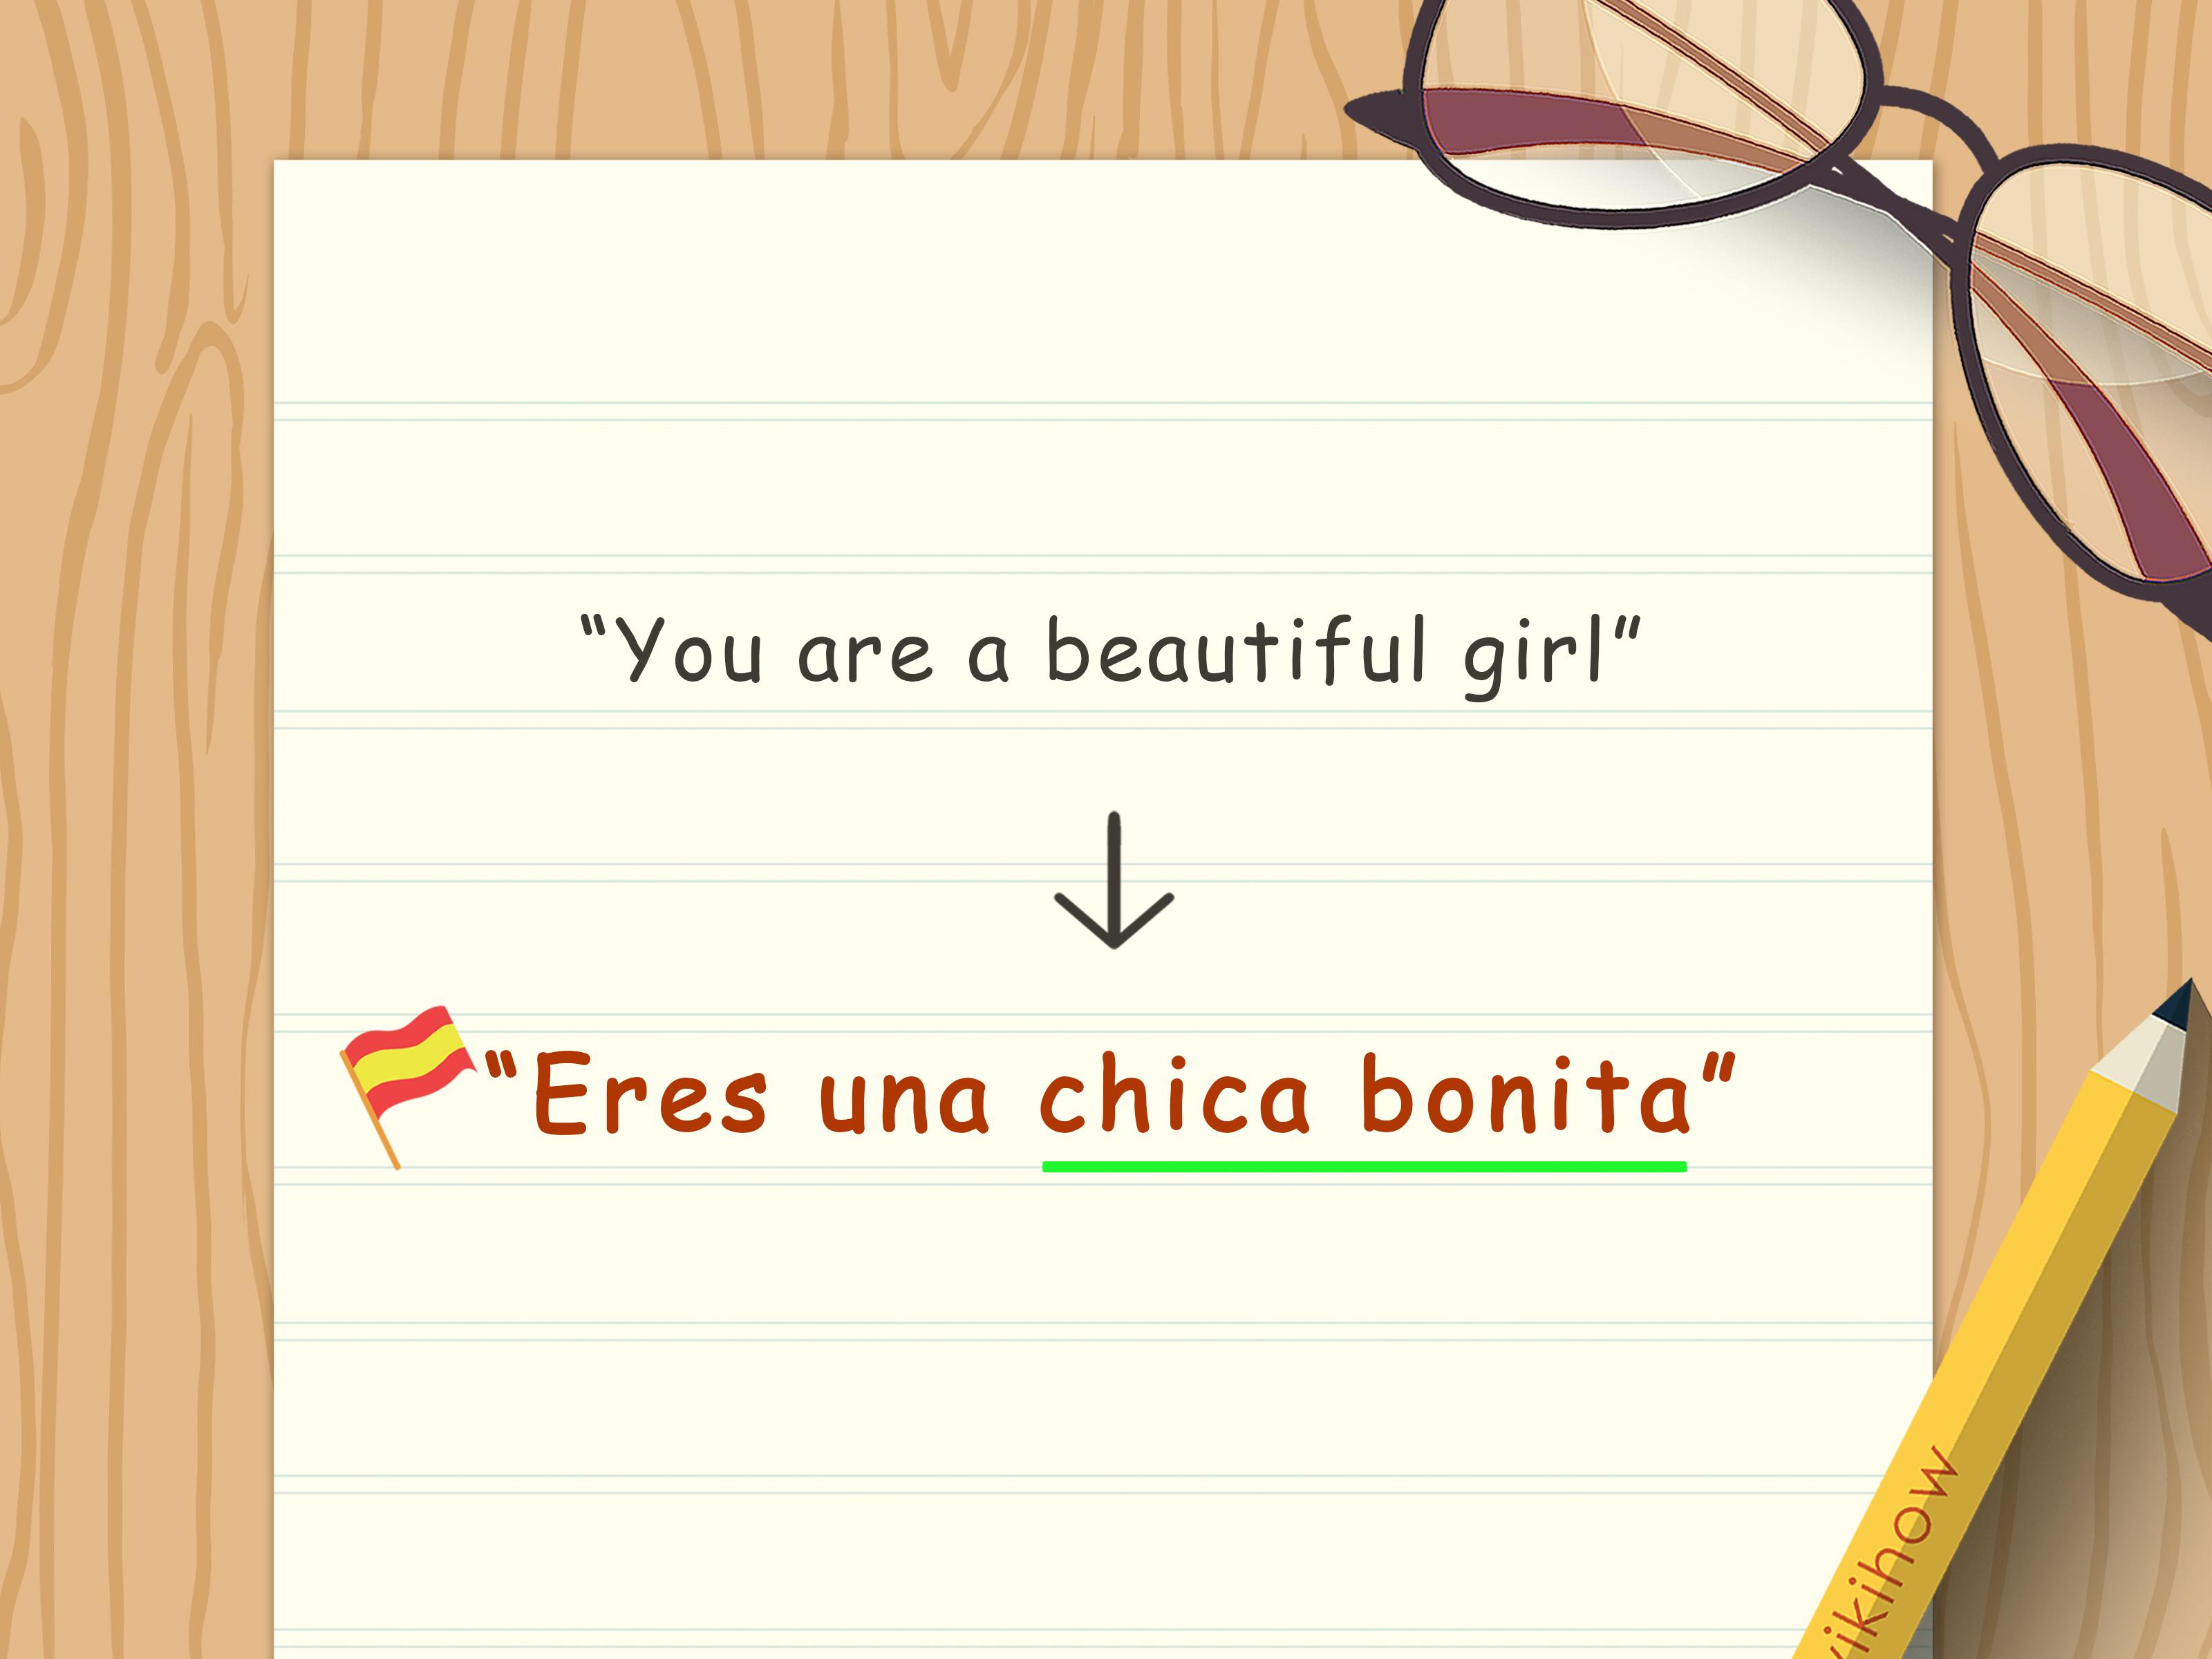 3 Ways To Say Beautiful Girl In Spanish